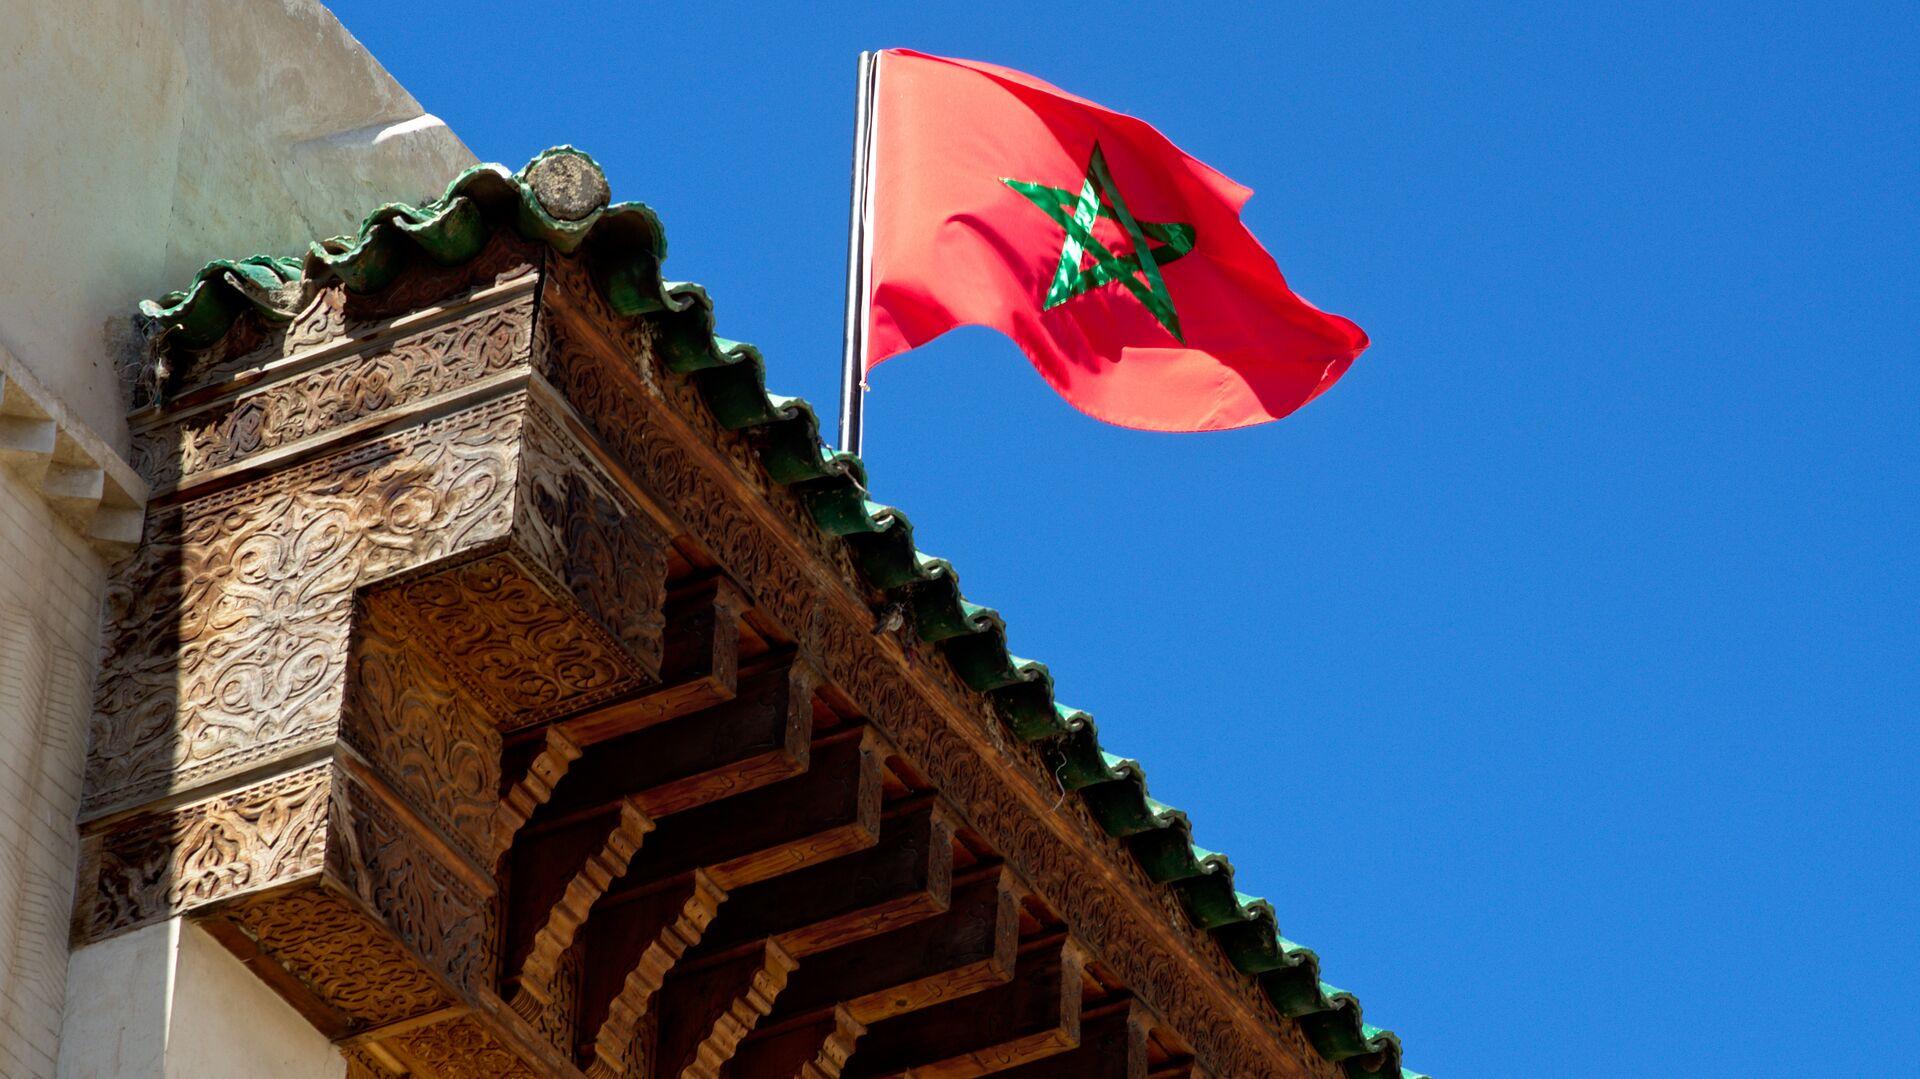 La bandera de Marruecos - Sputnik Mundo, 1920, 19.05.2021